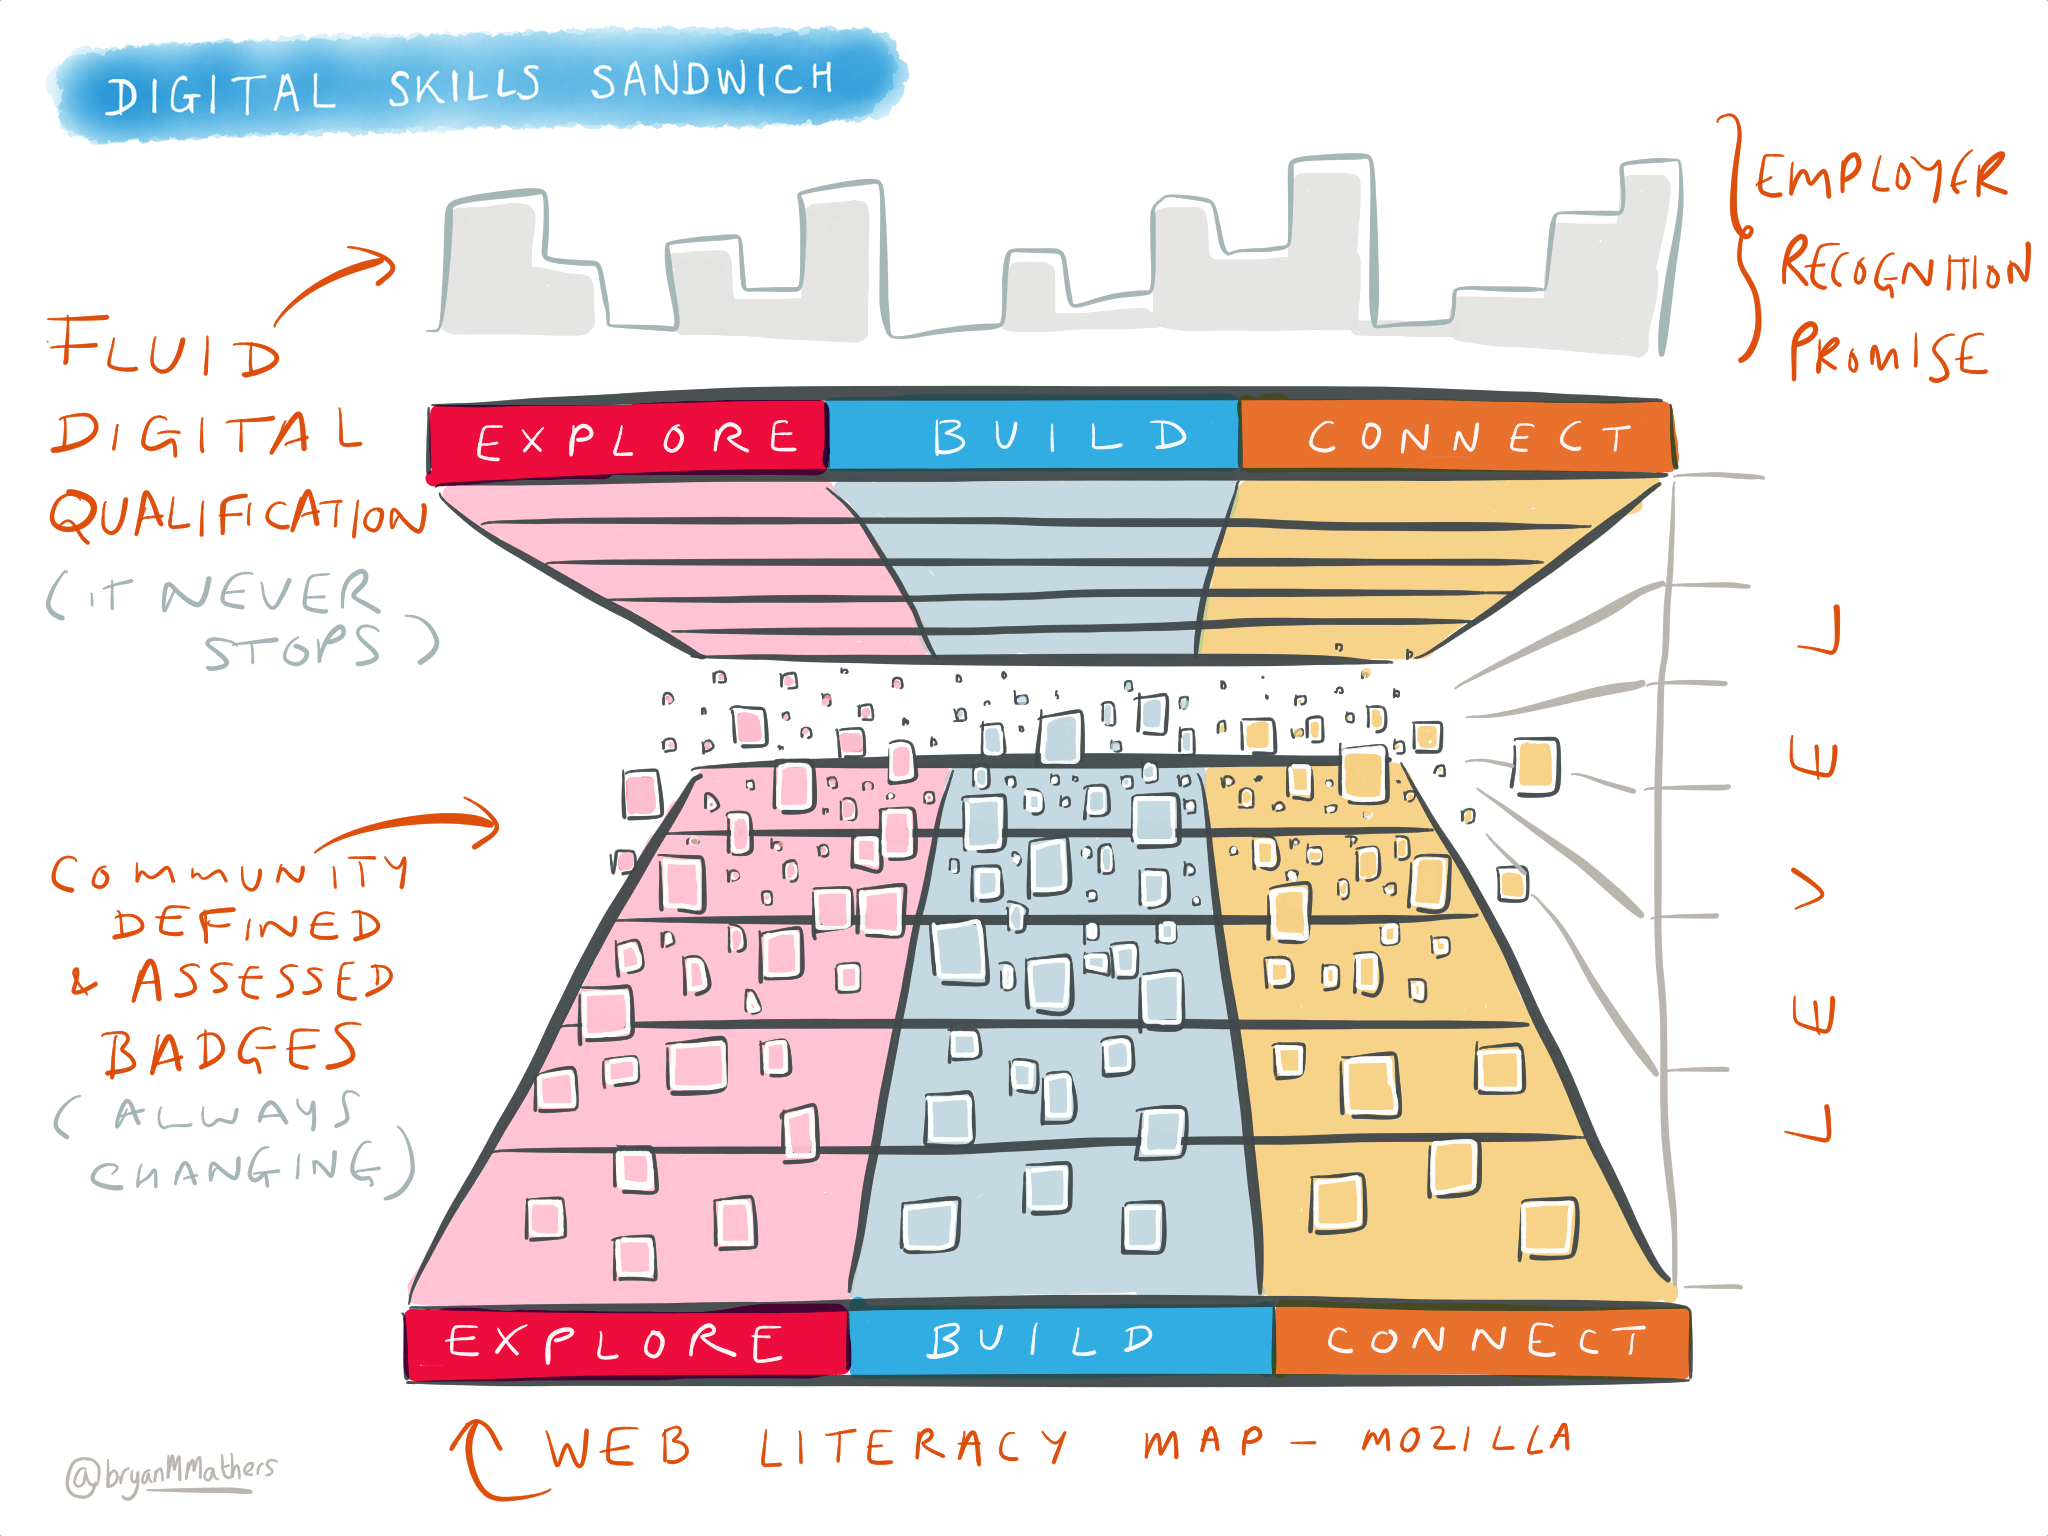 Digital Skills Sandwich